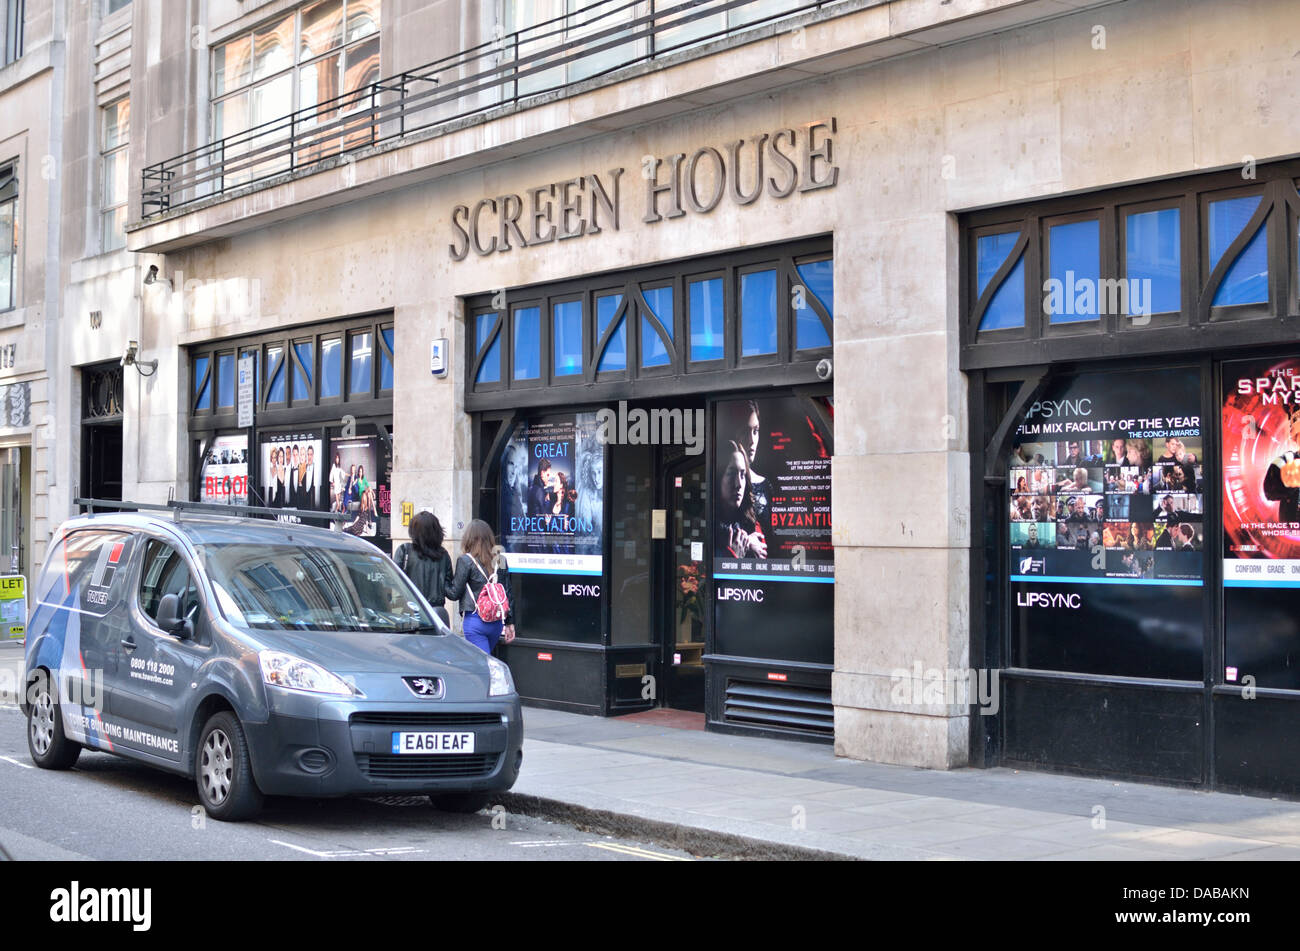 Screen House in Wardour Street, Soho, London, UK. - Stock Image